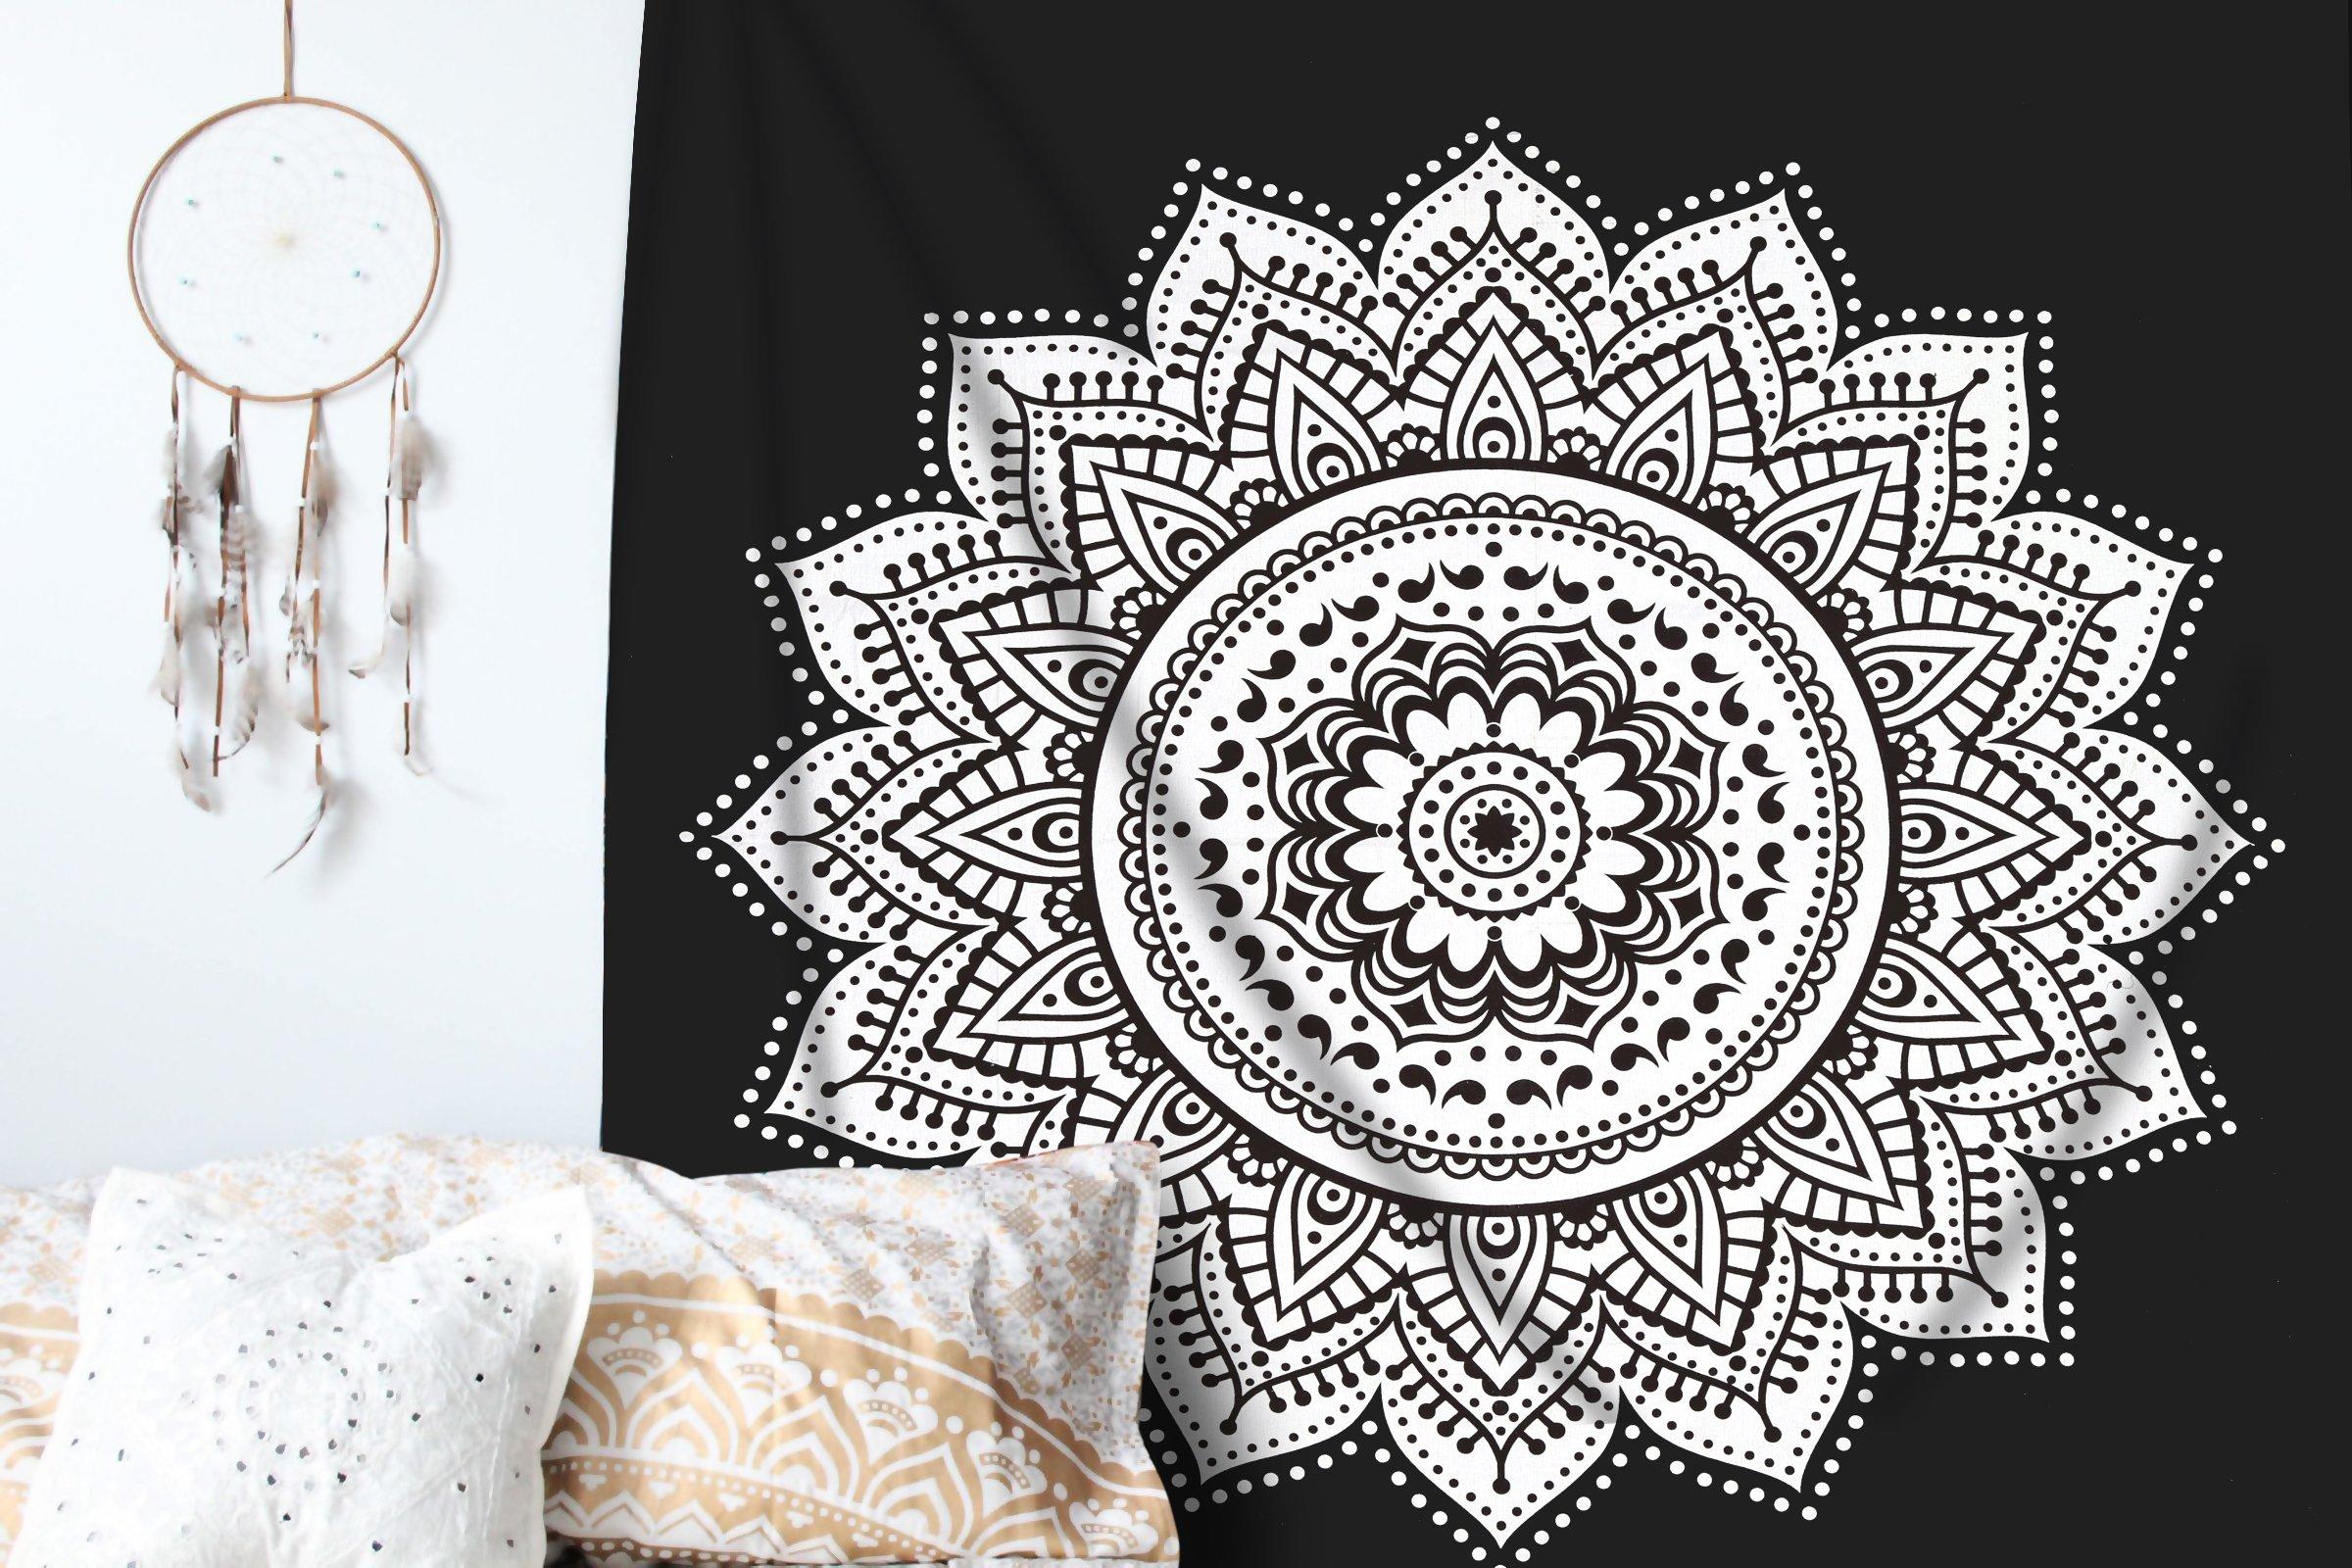 Ombre Mandala Tapestry - Black and White Indian/Hindu Wall Hanging - 100% Cotton - Bohemian Wall Decor by RawyalCrafts by RawyalCrafts